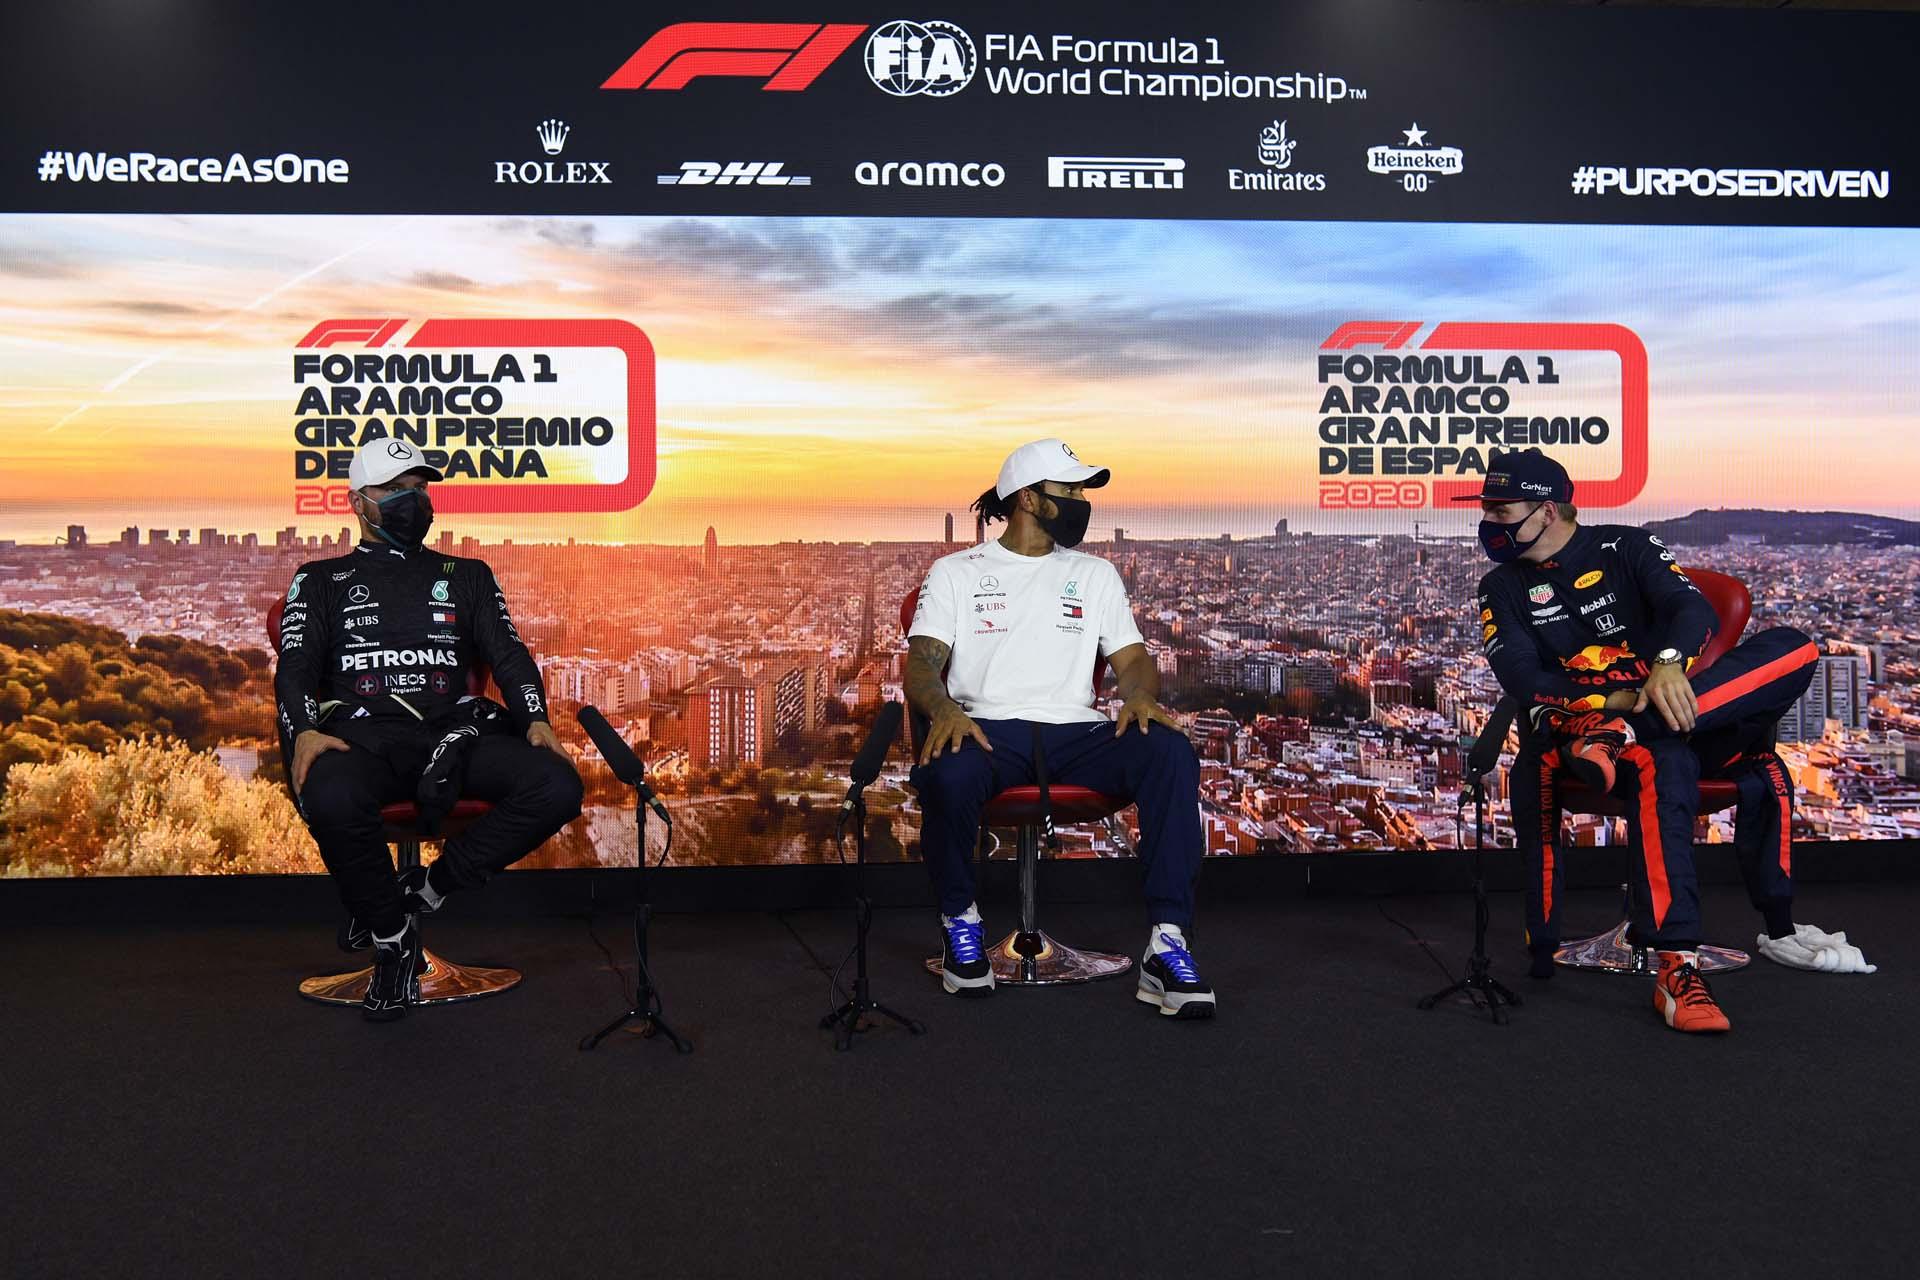 F1 Grand Prix of Spain - Qualifying